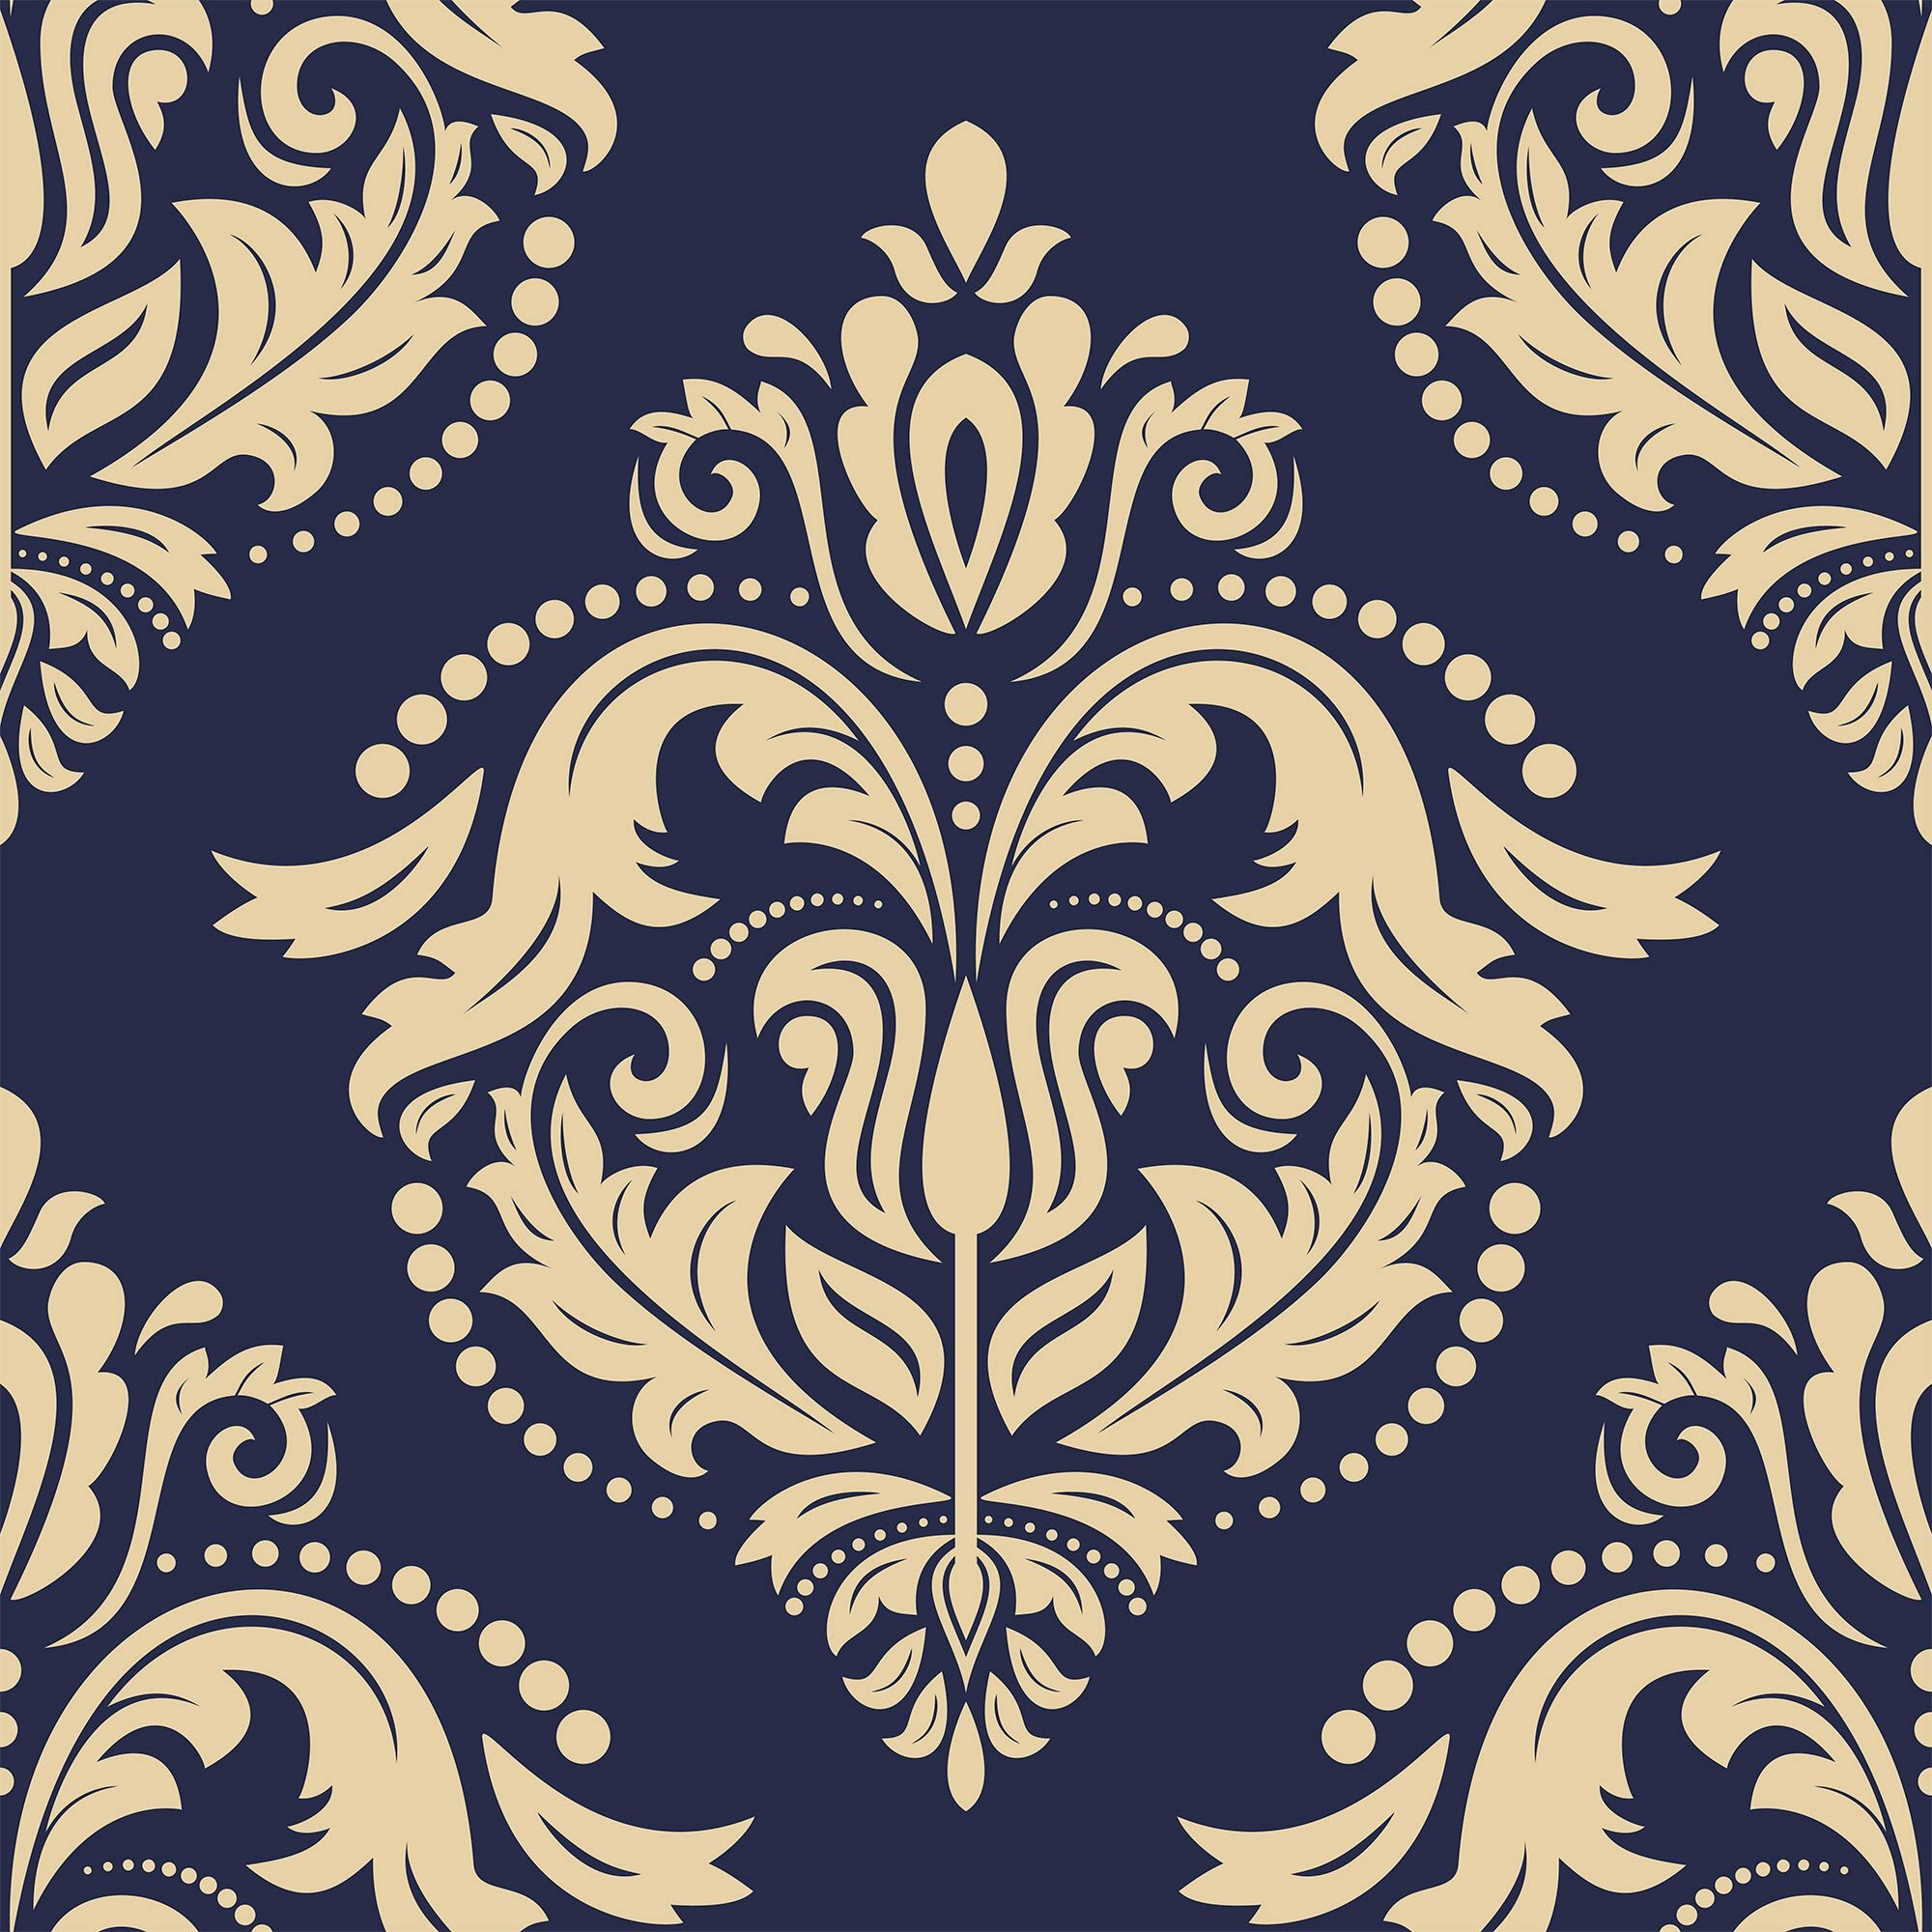 House Of Hampton Reneau Basic Removable Peel And Stick Wallpaper Panel Wayfair